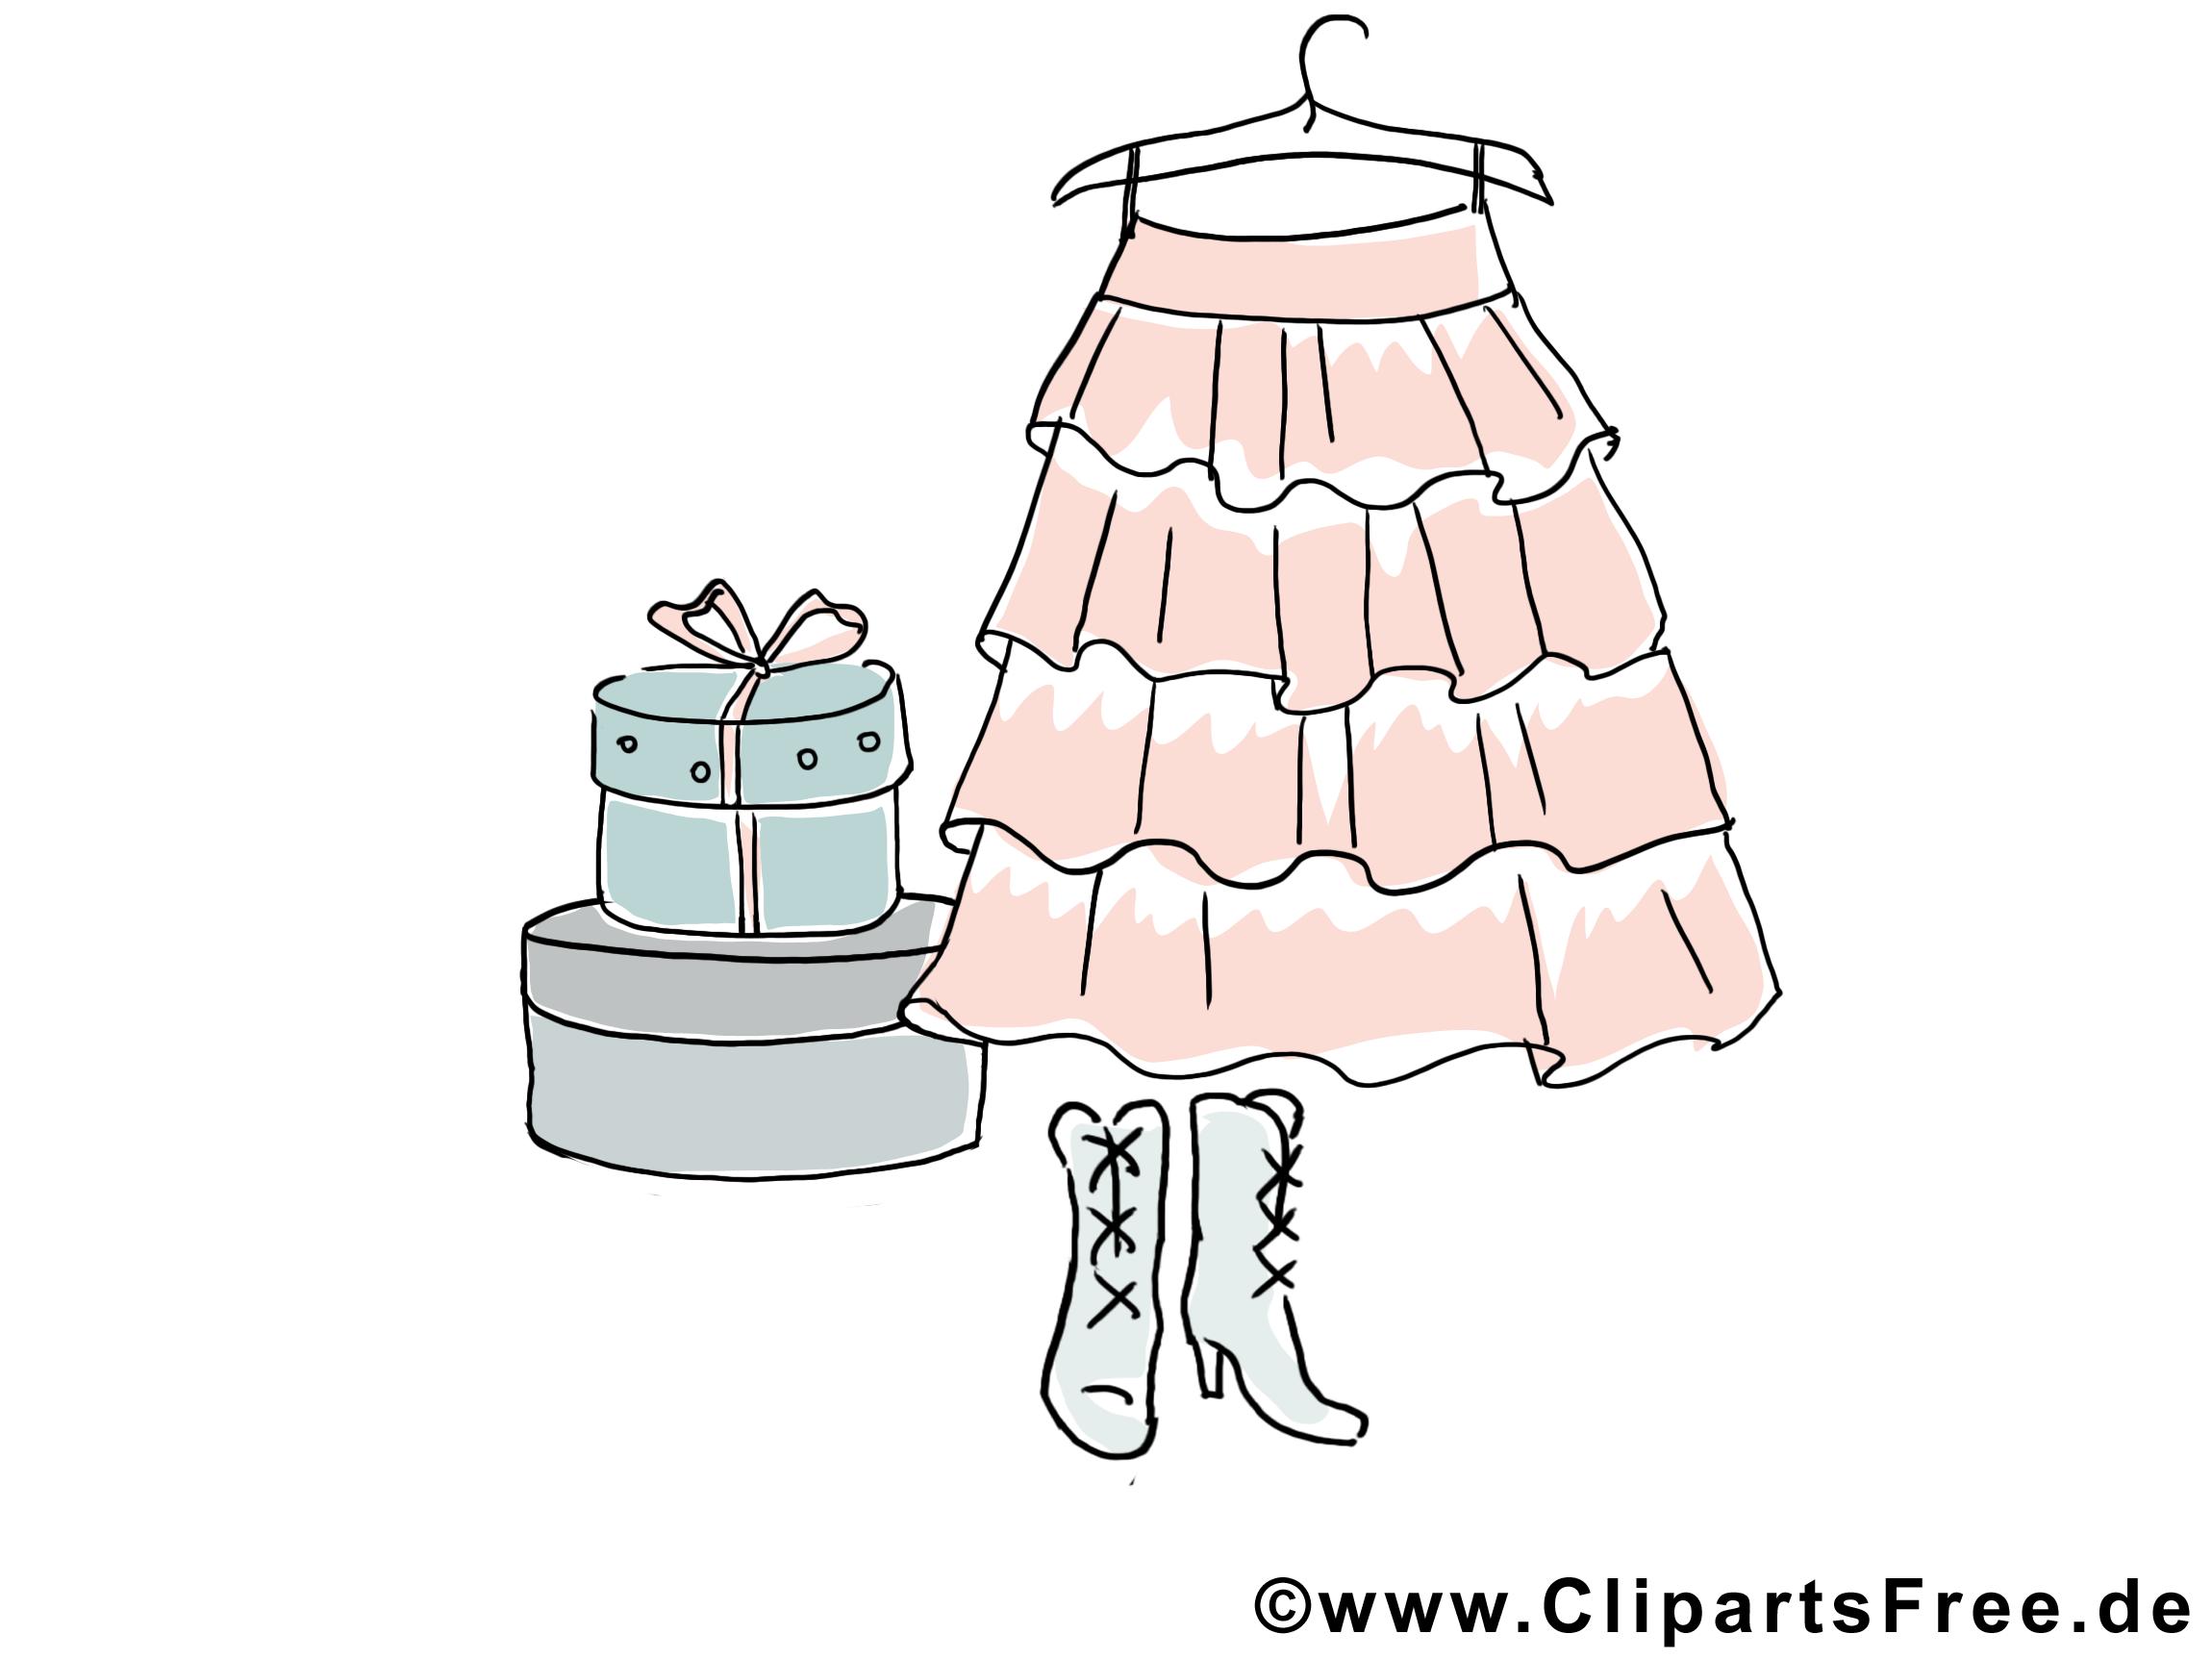 Garderobenständer clipart  Kleiderhaken Clipart | tentfox.com